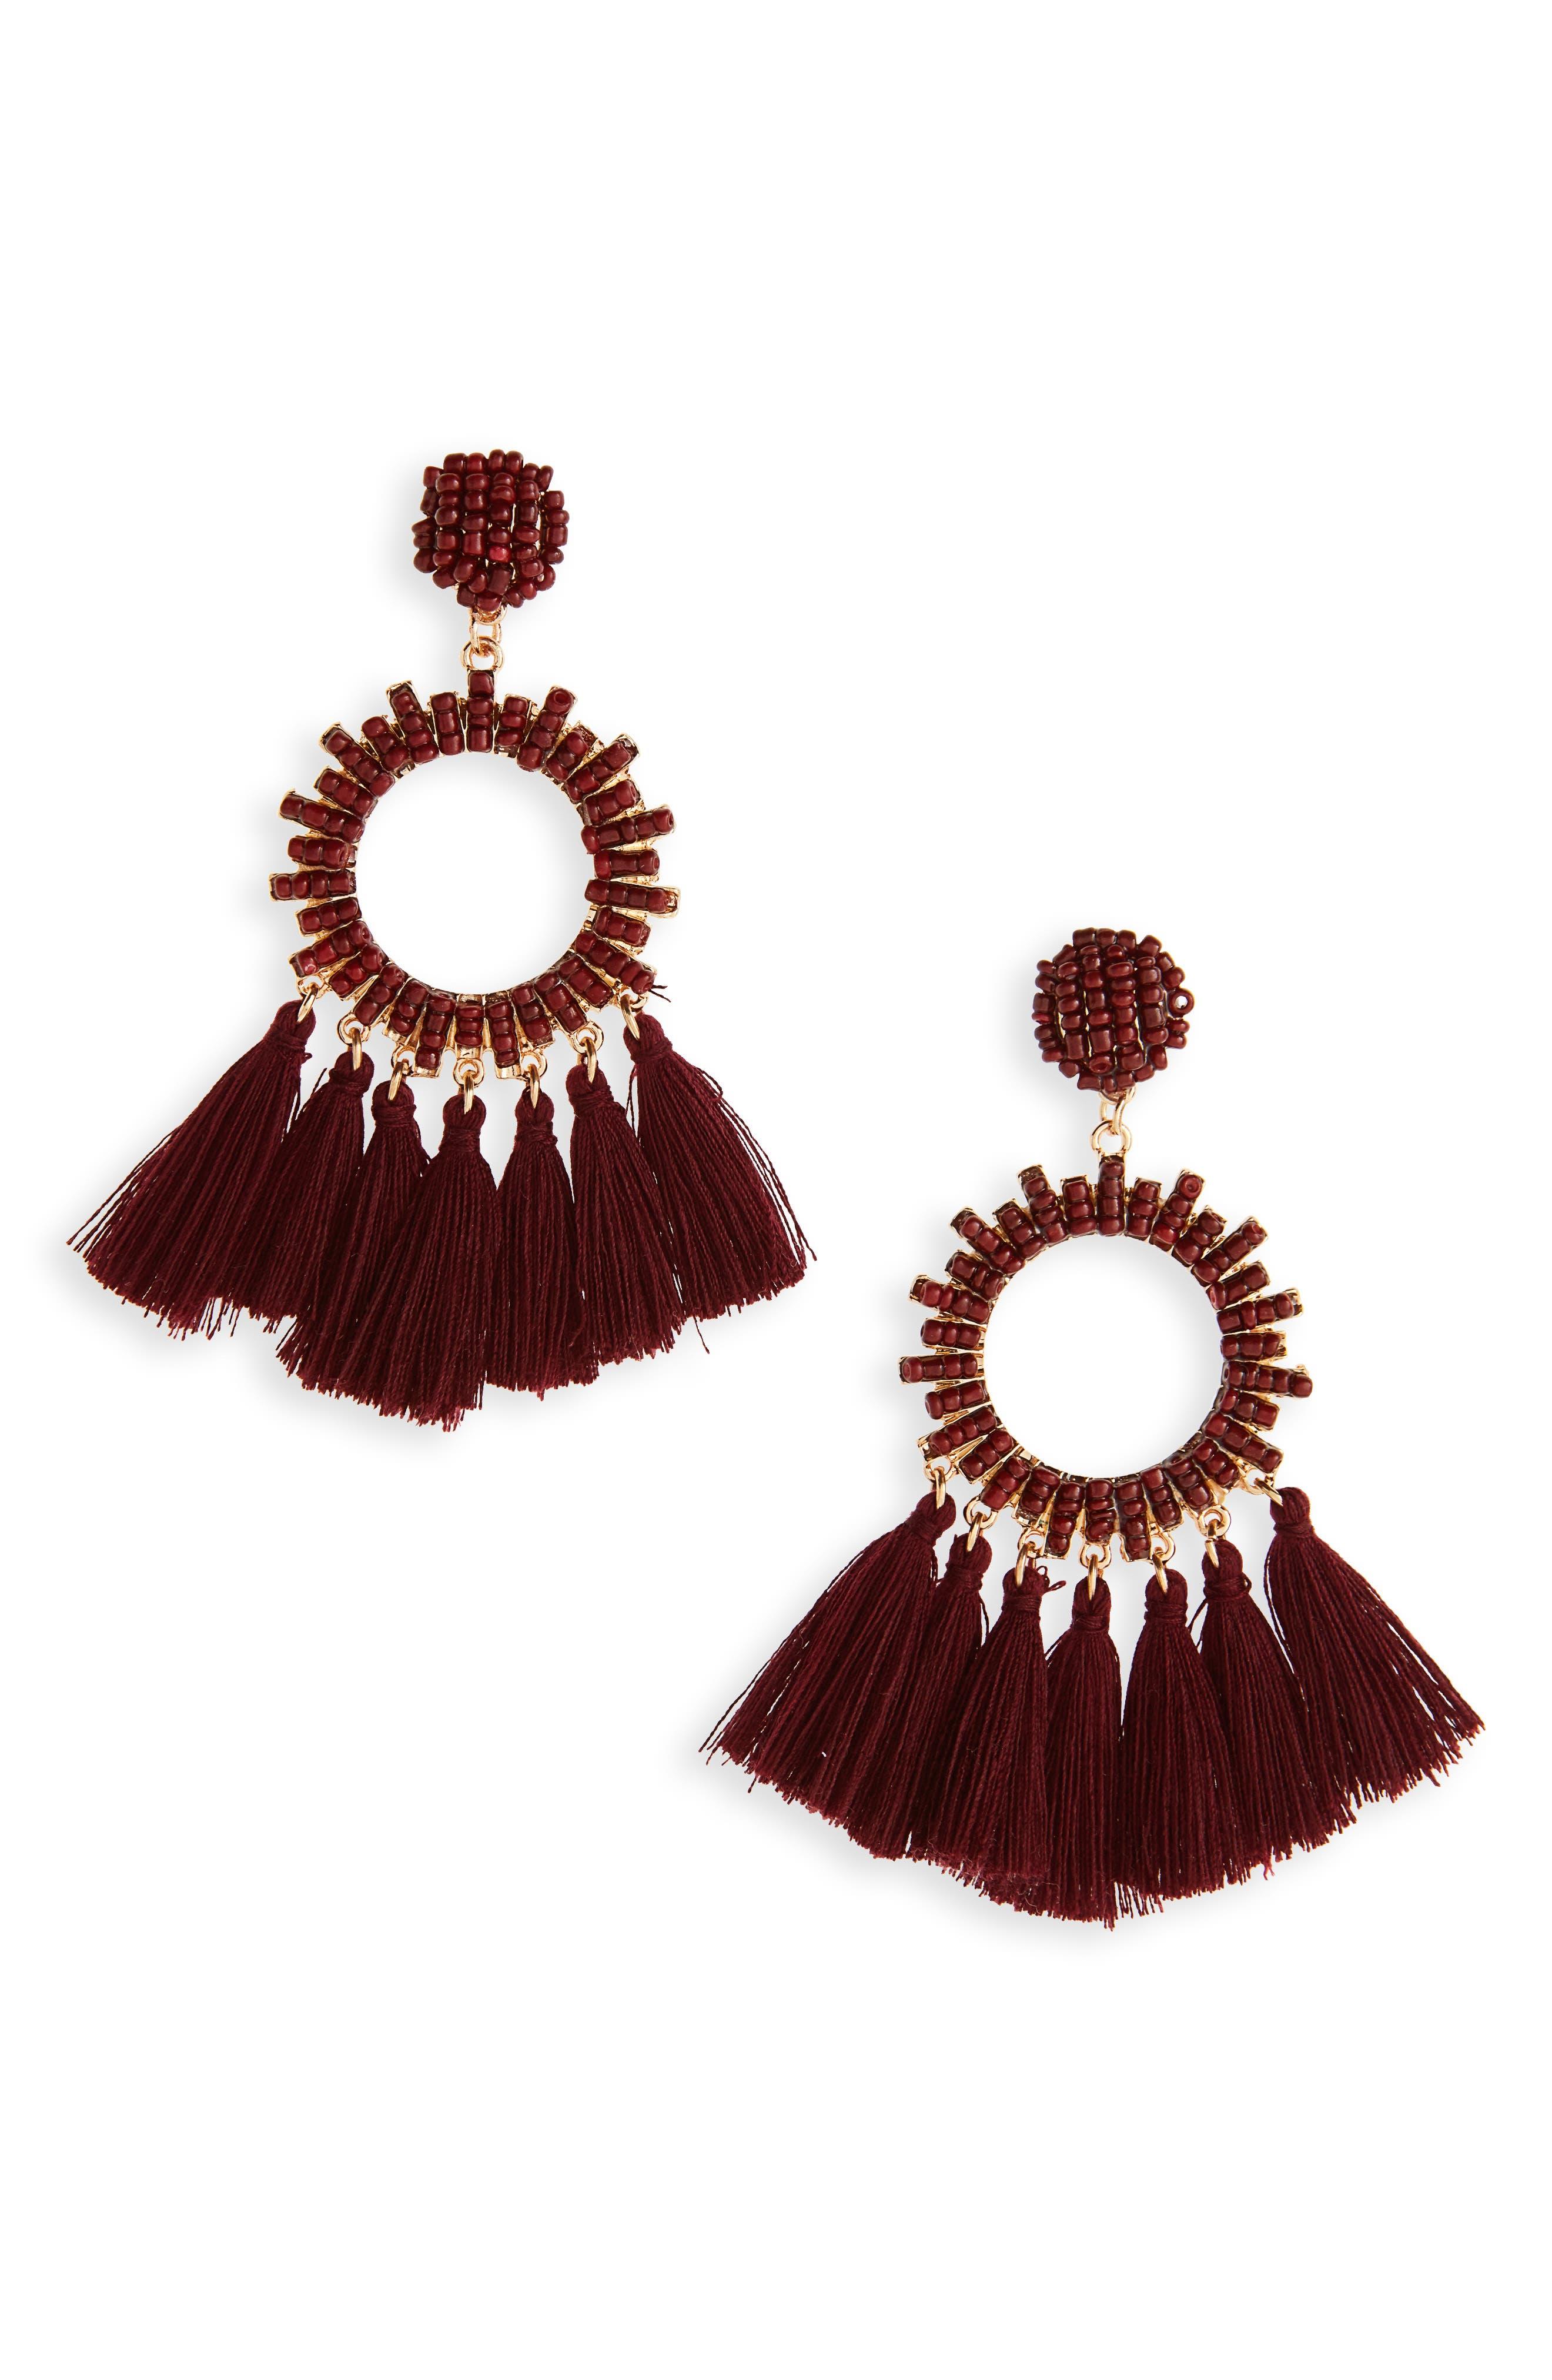 Beaded Tassel Hoop Earrings,                             Main thumbnail 1, color,                             710